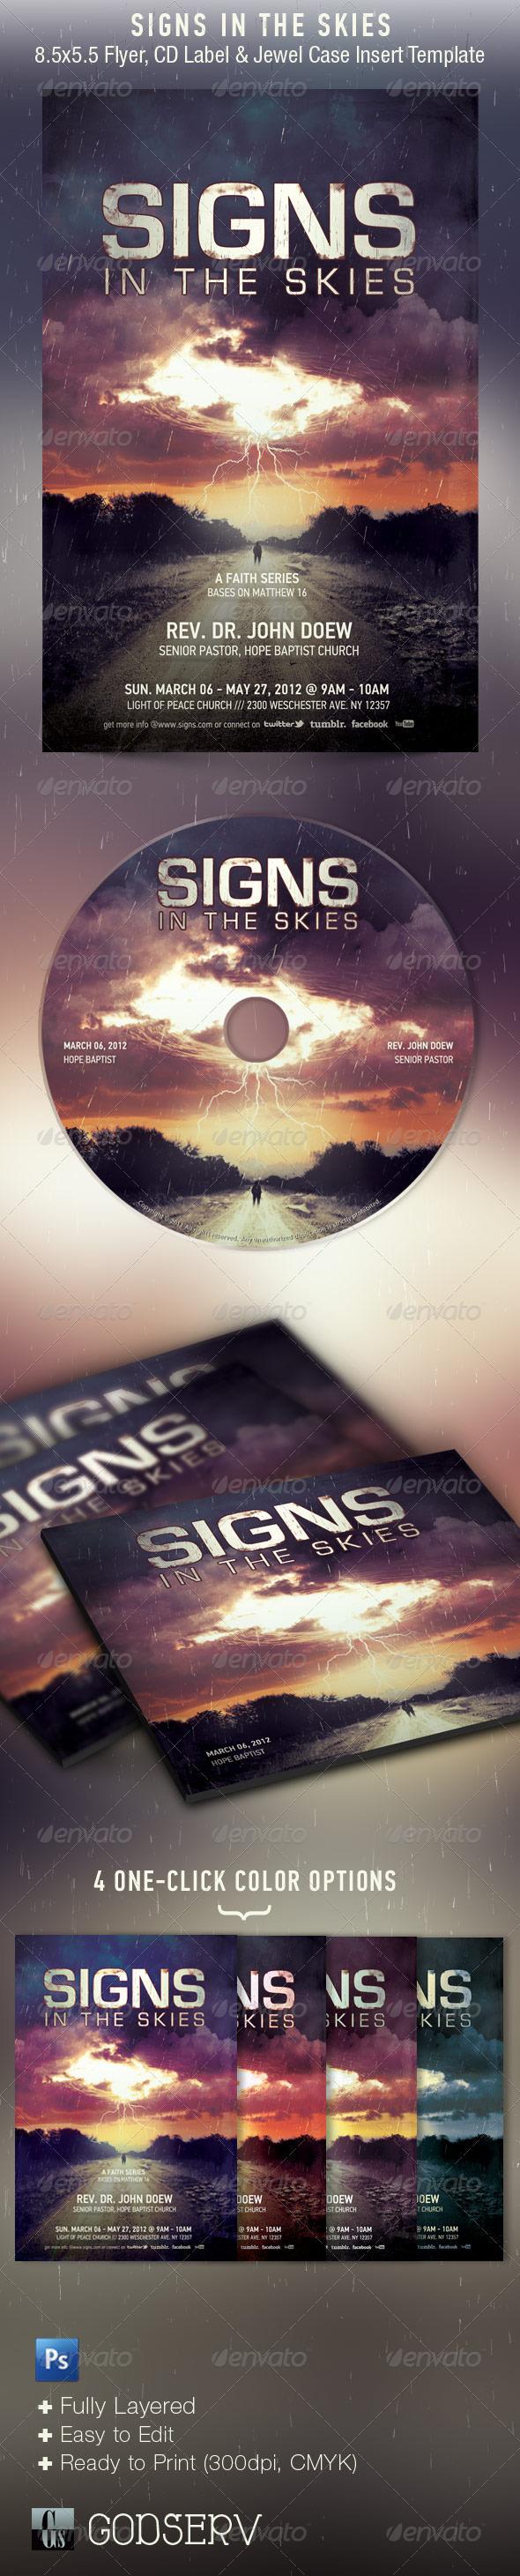 Signs Church Flyer CD Template - Church Flyers